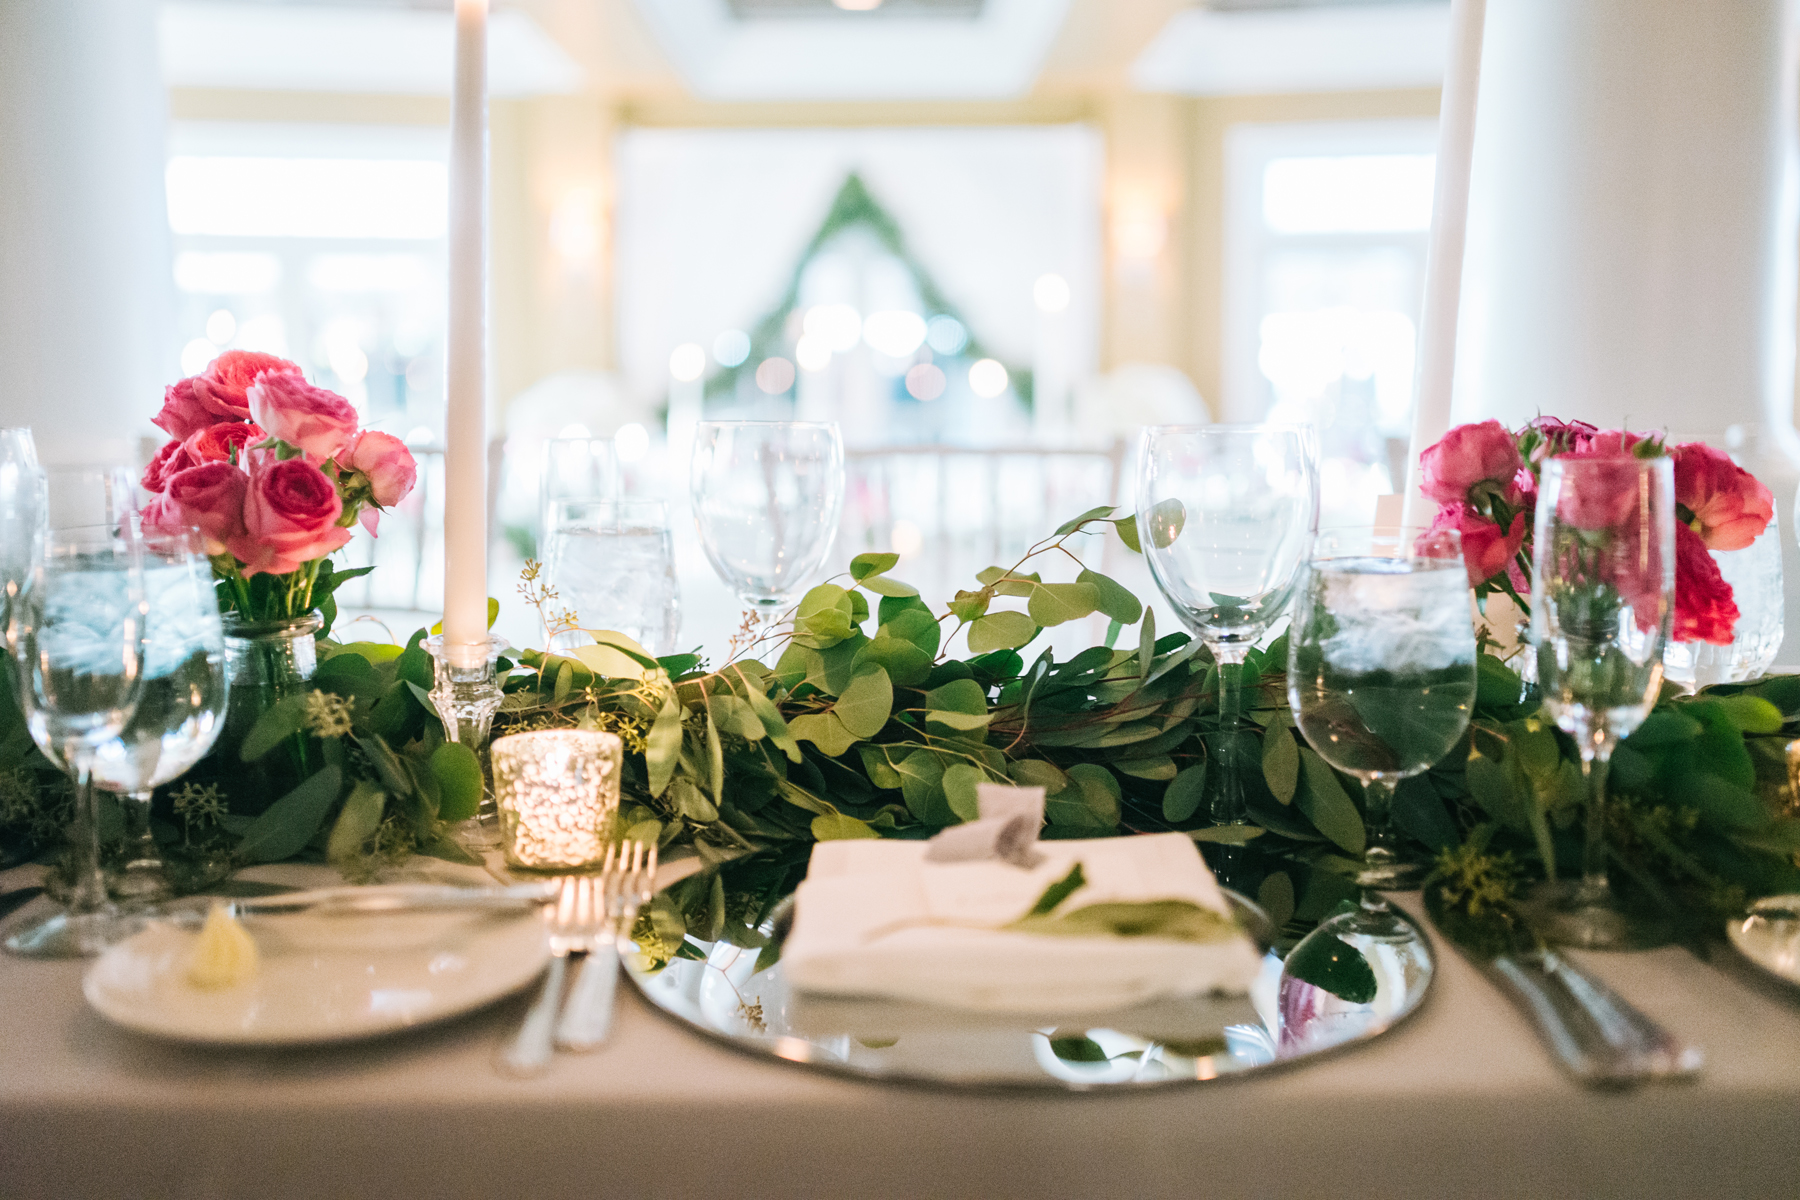 Wedding Reception Decor | Silver Mercury Votives | Tableau Events